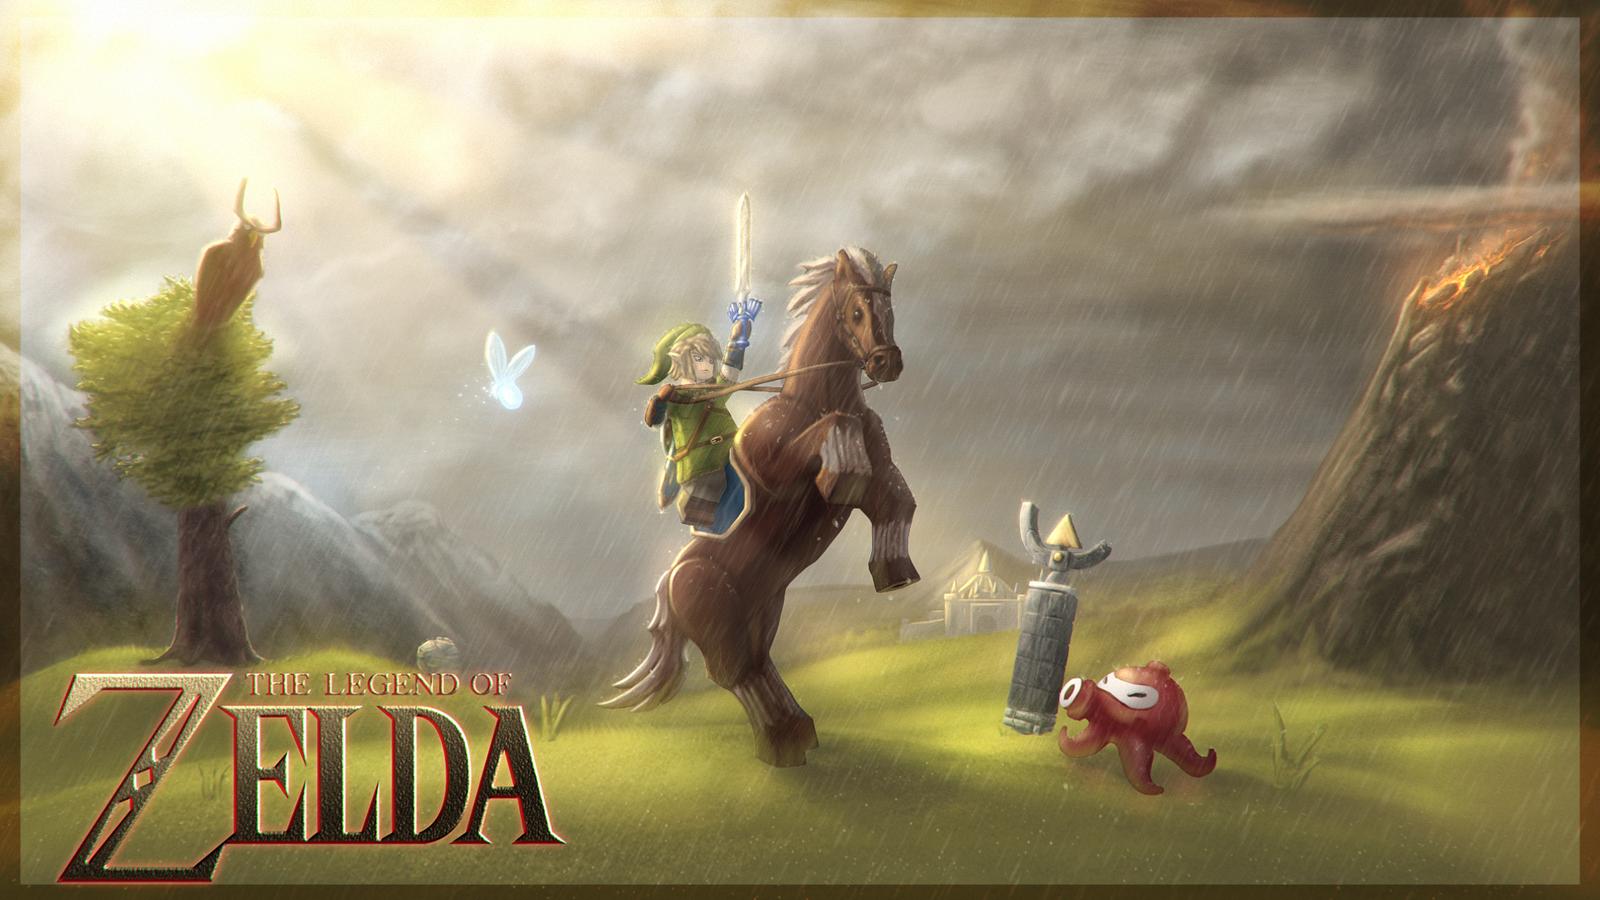 - The Legend of Zelda LEGO Project - by Ragaru